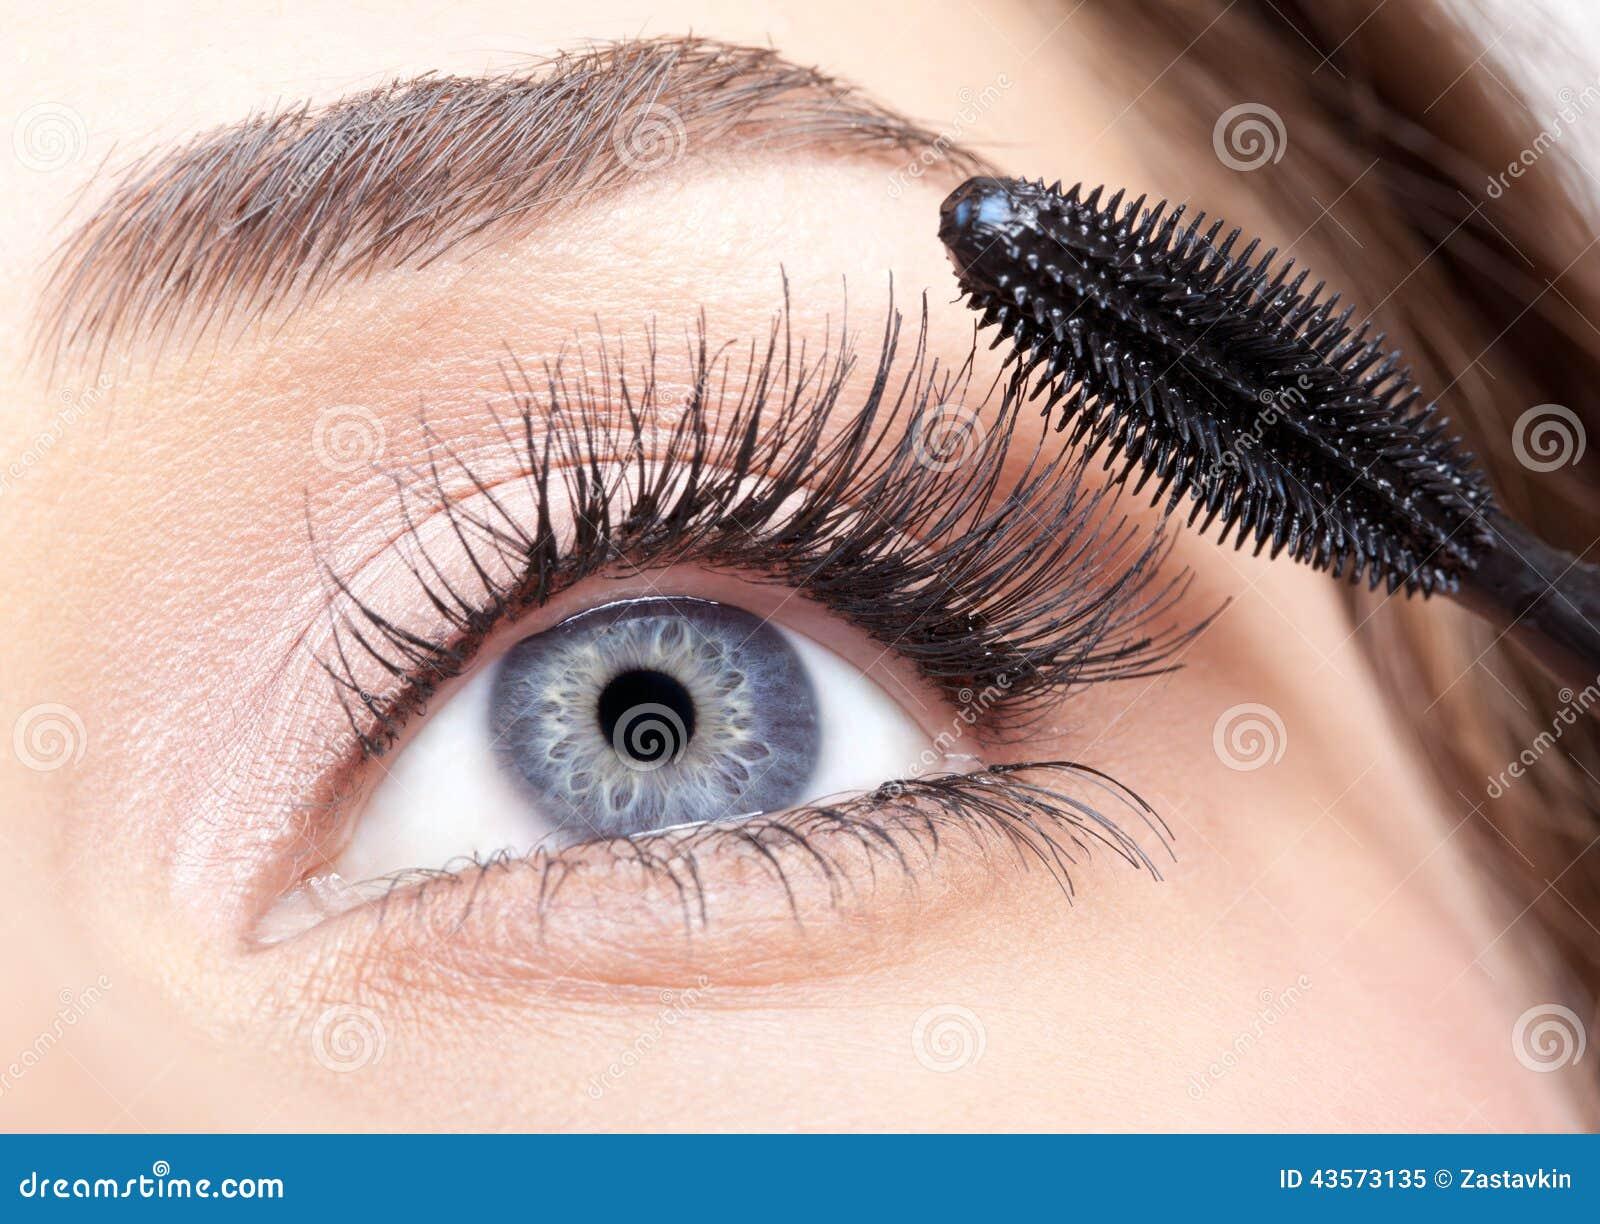 Mascara Makeup Stock Image Image Of Clean Pretty Mascara 43573135